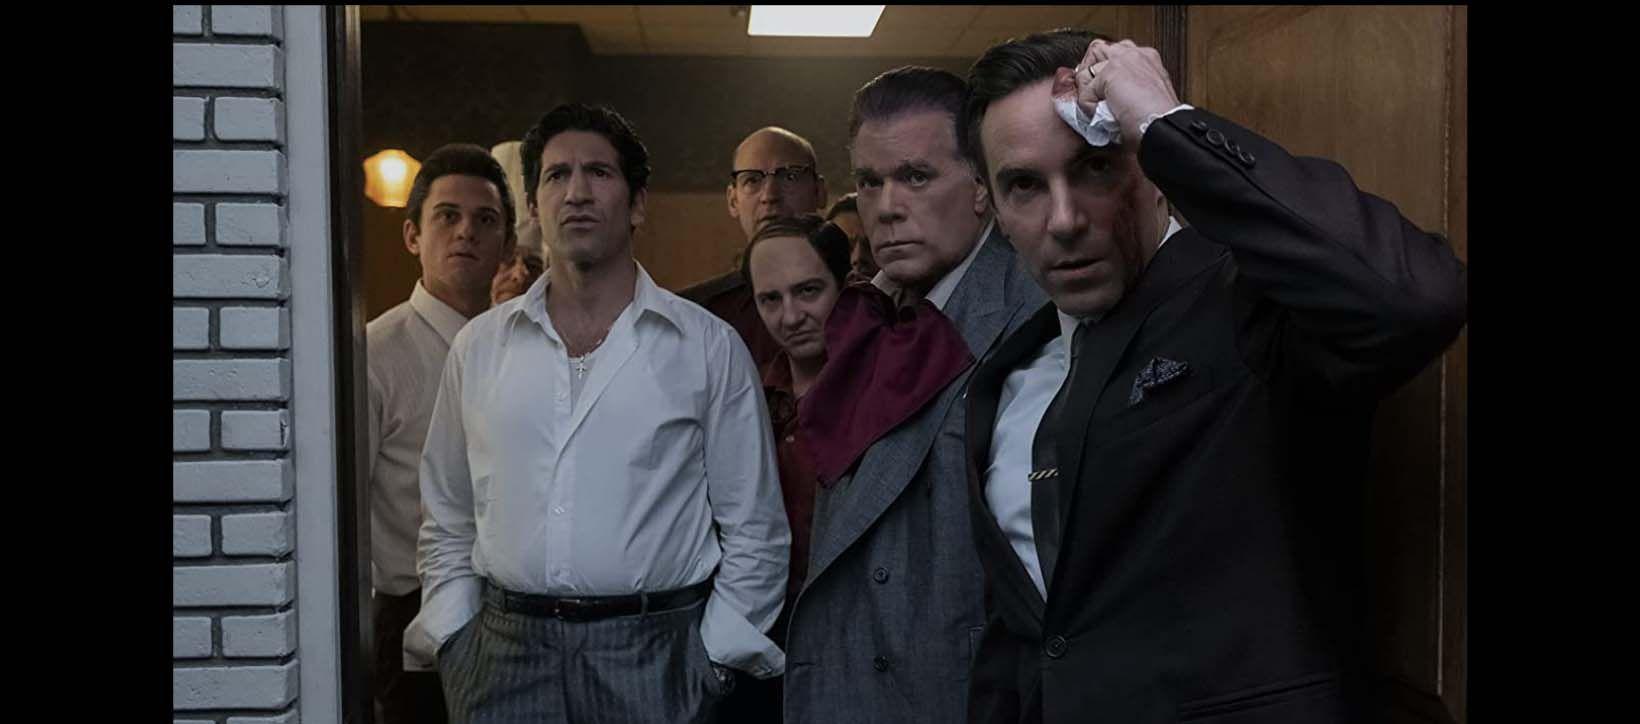 Ray Liotta, Alessandro Nivola, Corey Stoll, Jon Bernthal, John Magaro, and Billy Magnussen in 'The Many Saints of Newark'